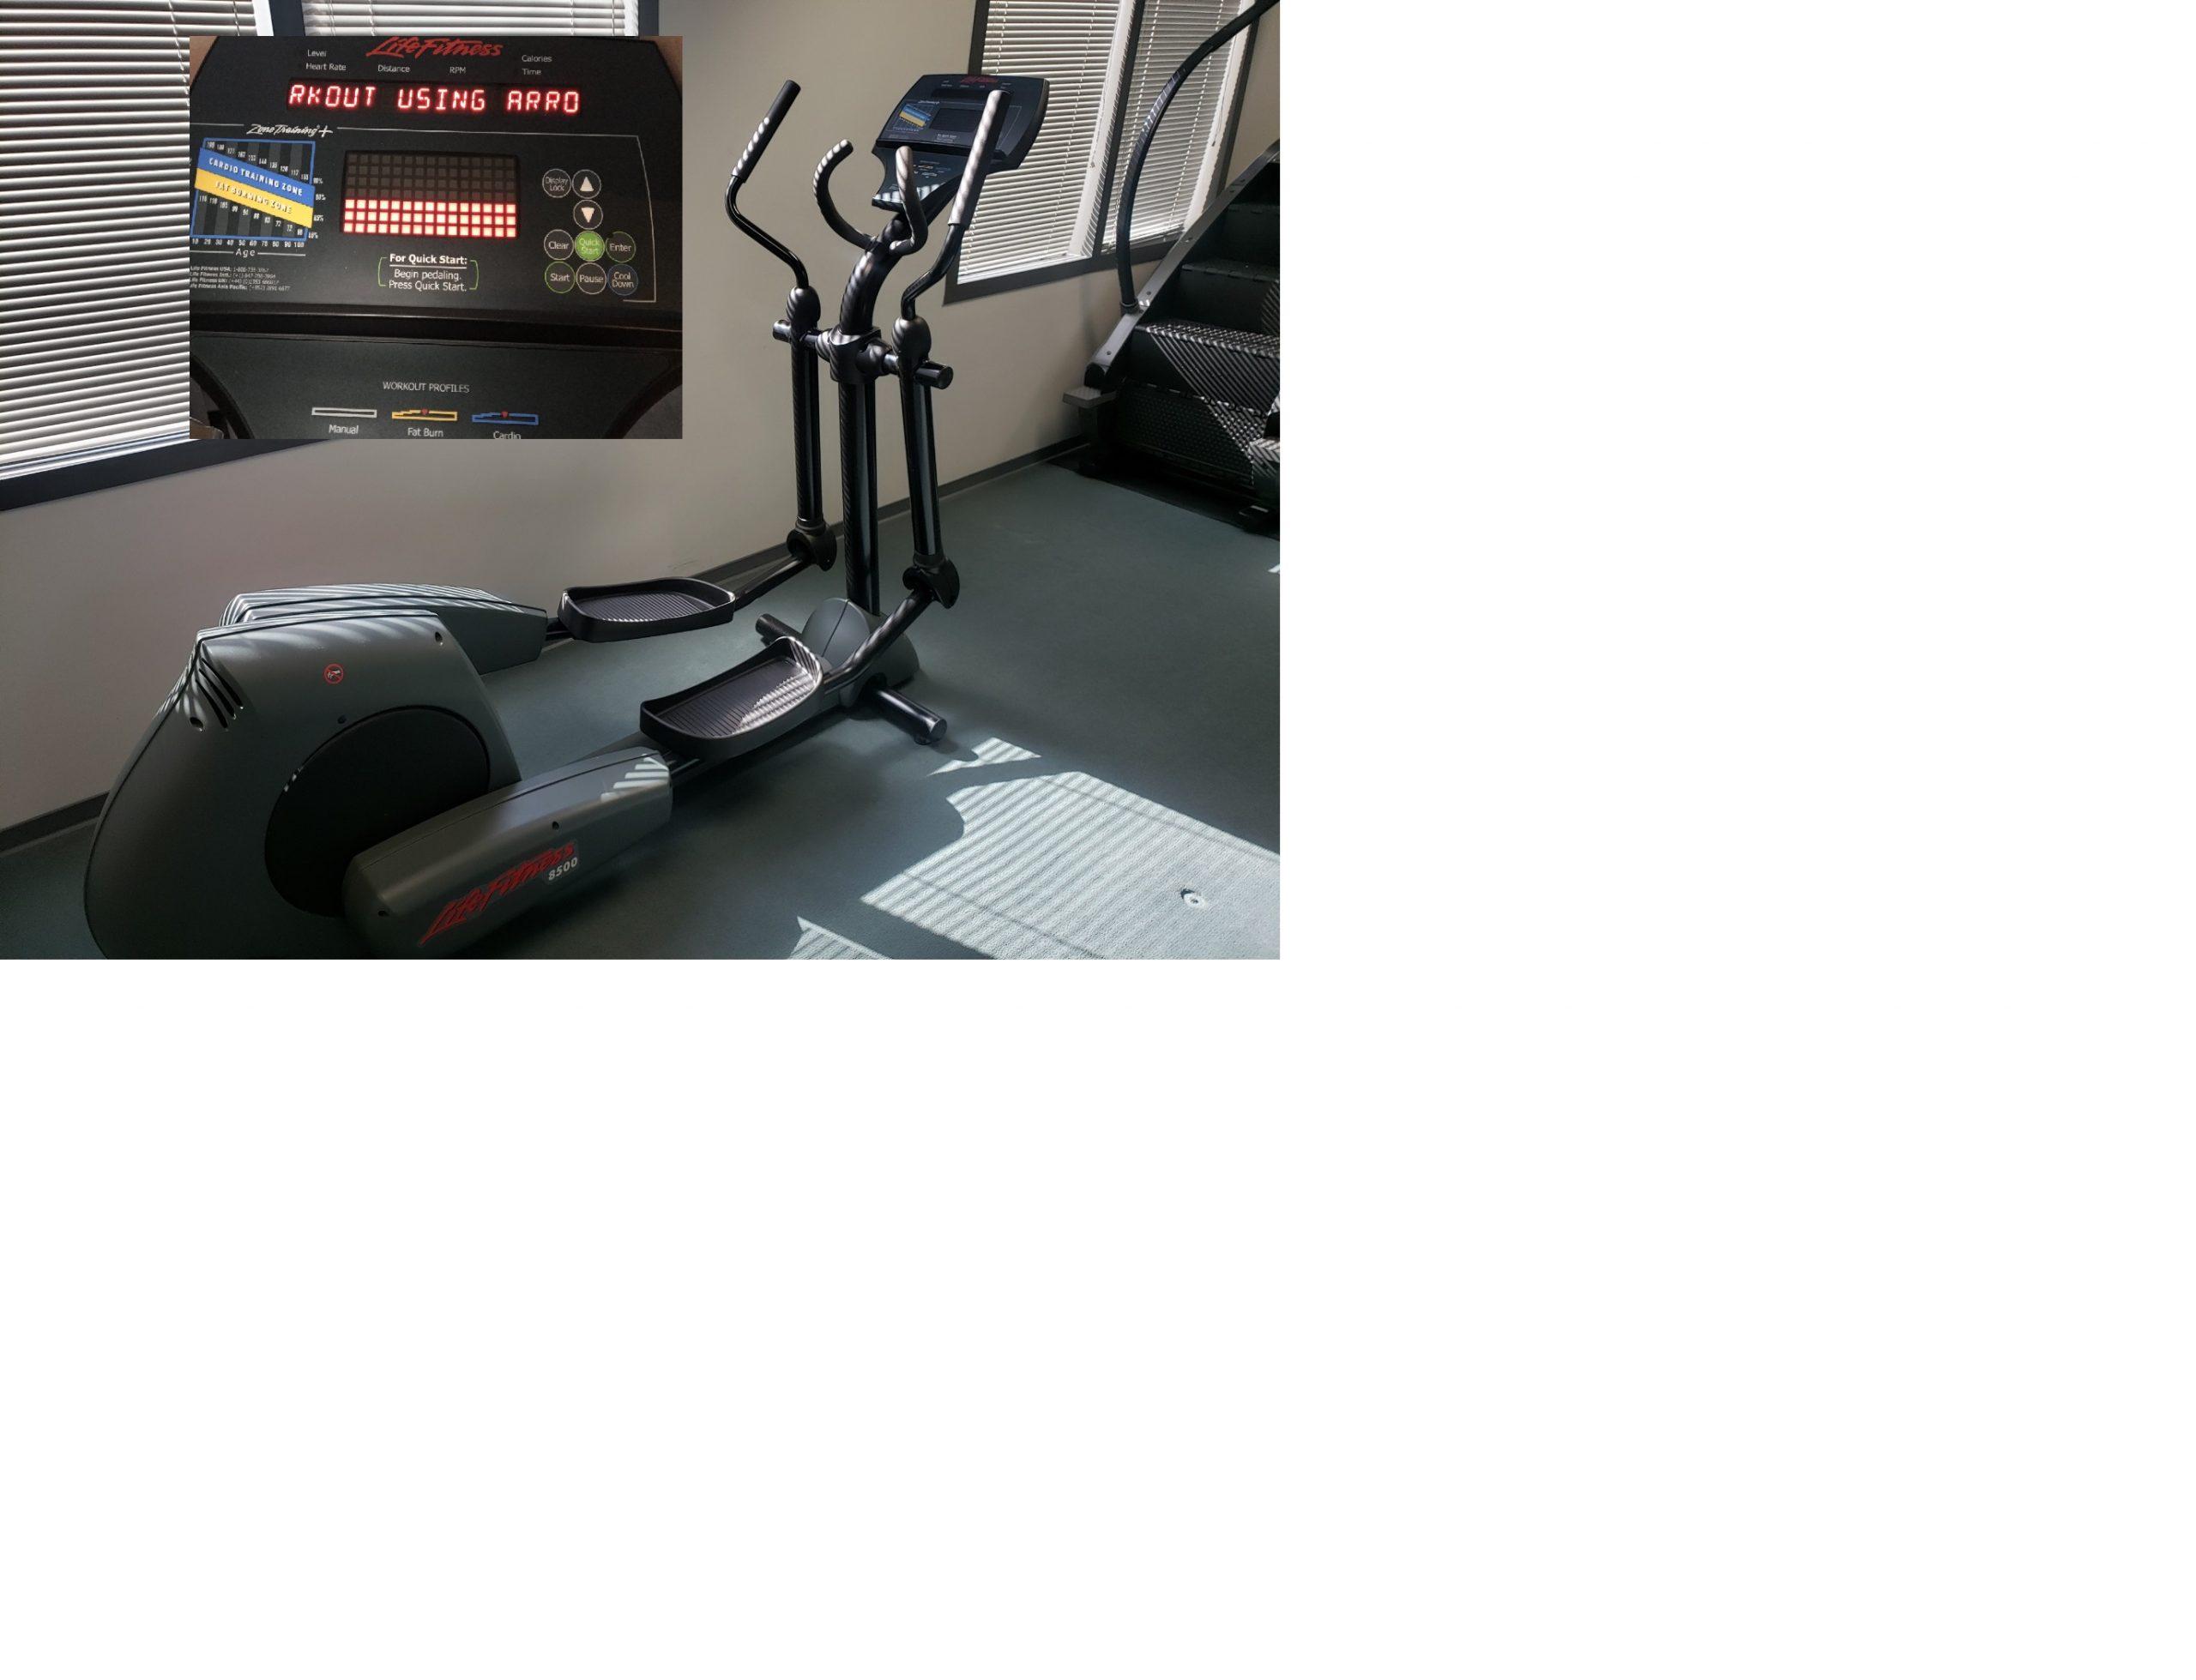 Life Fitness CT 8500 Elliptical Image